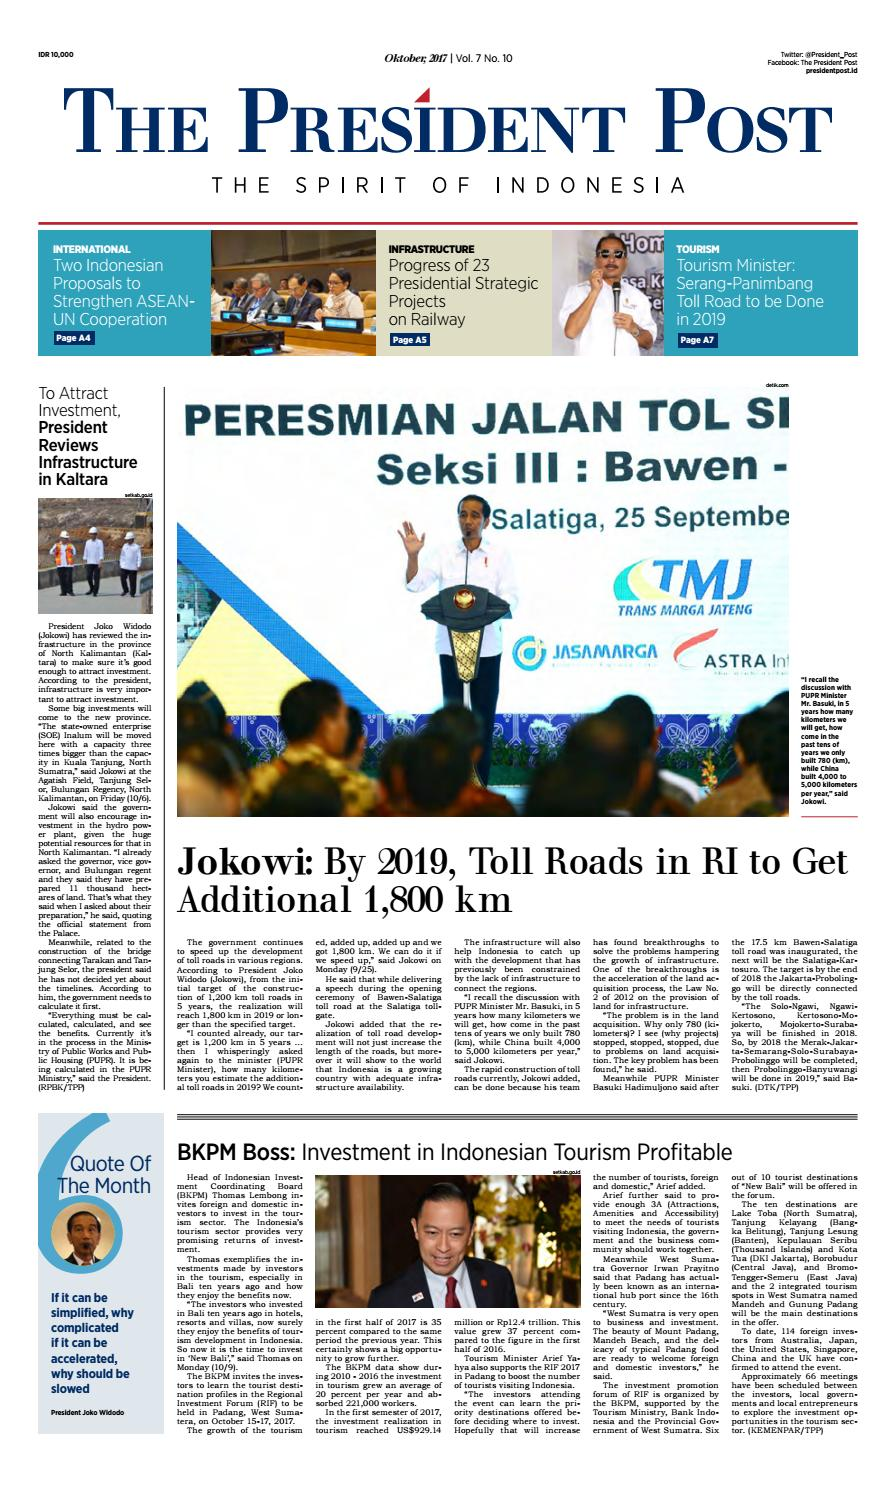 The President Post English Edition Oktober 2017 By Ksp Kav 3 User Issuu